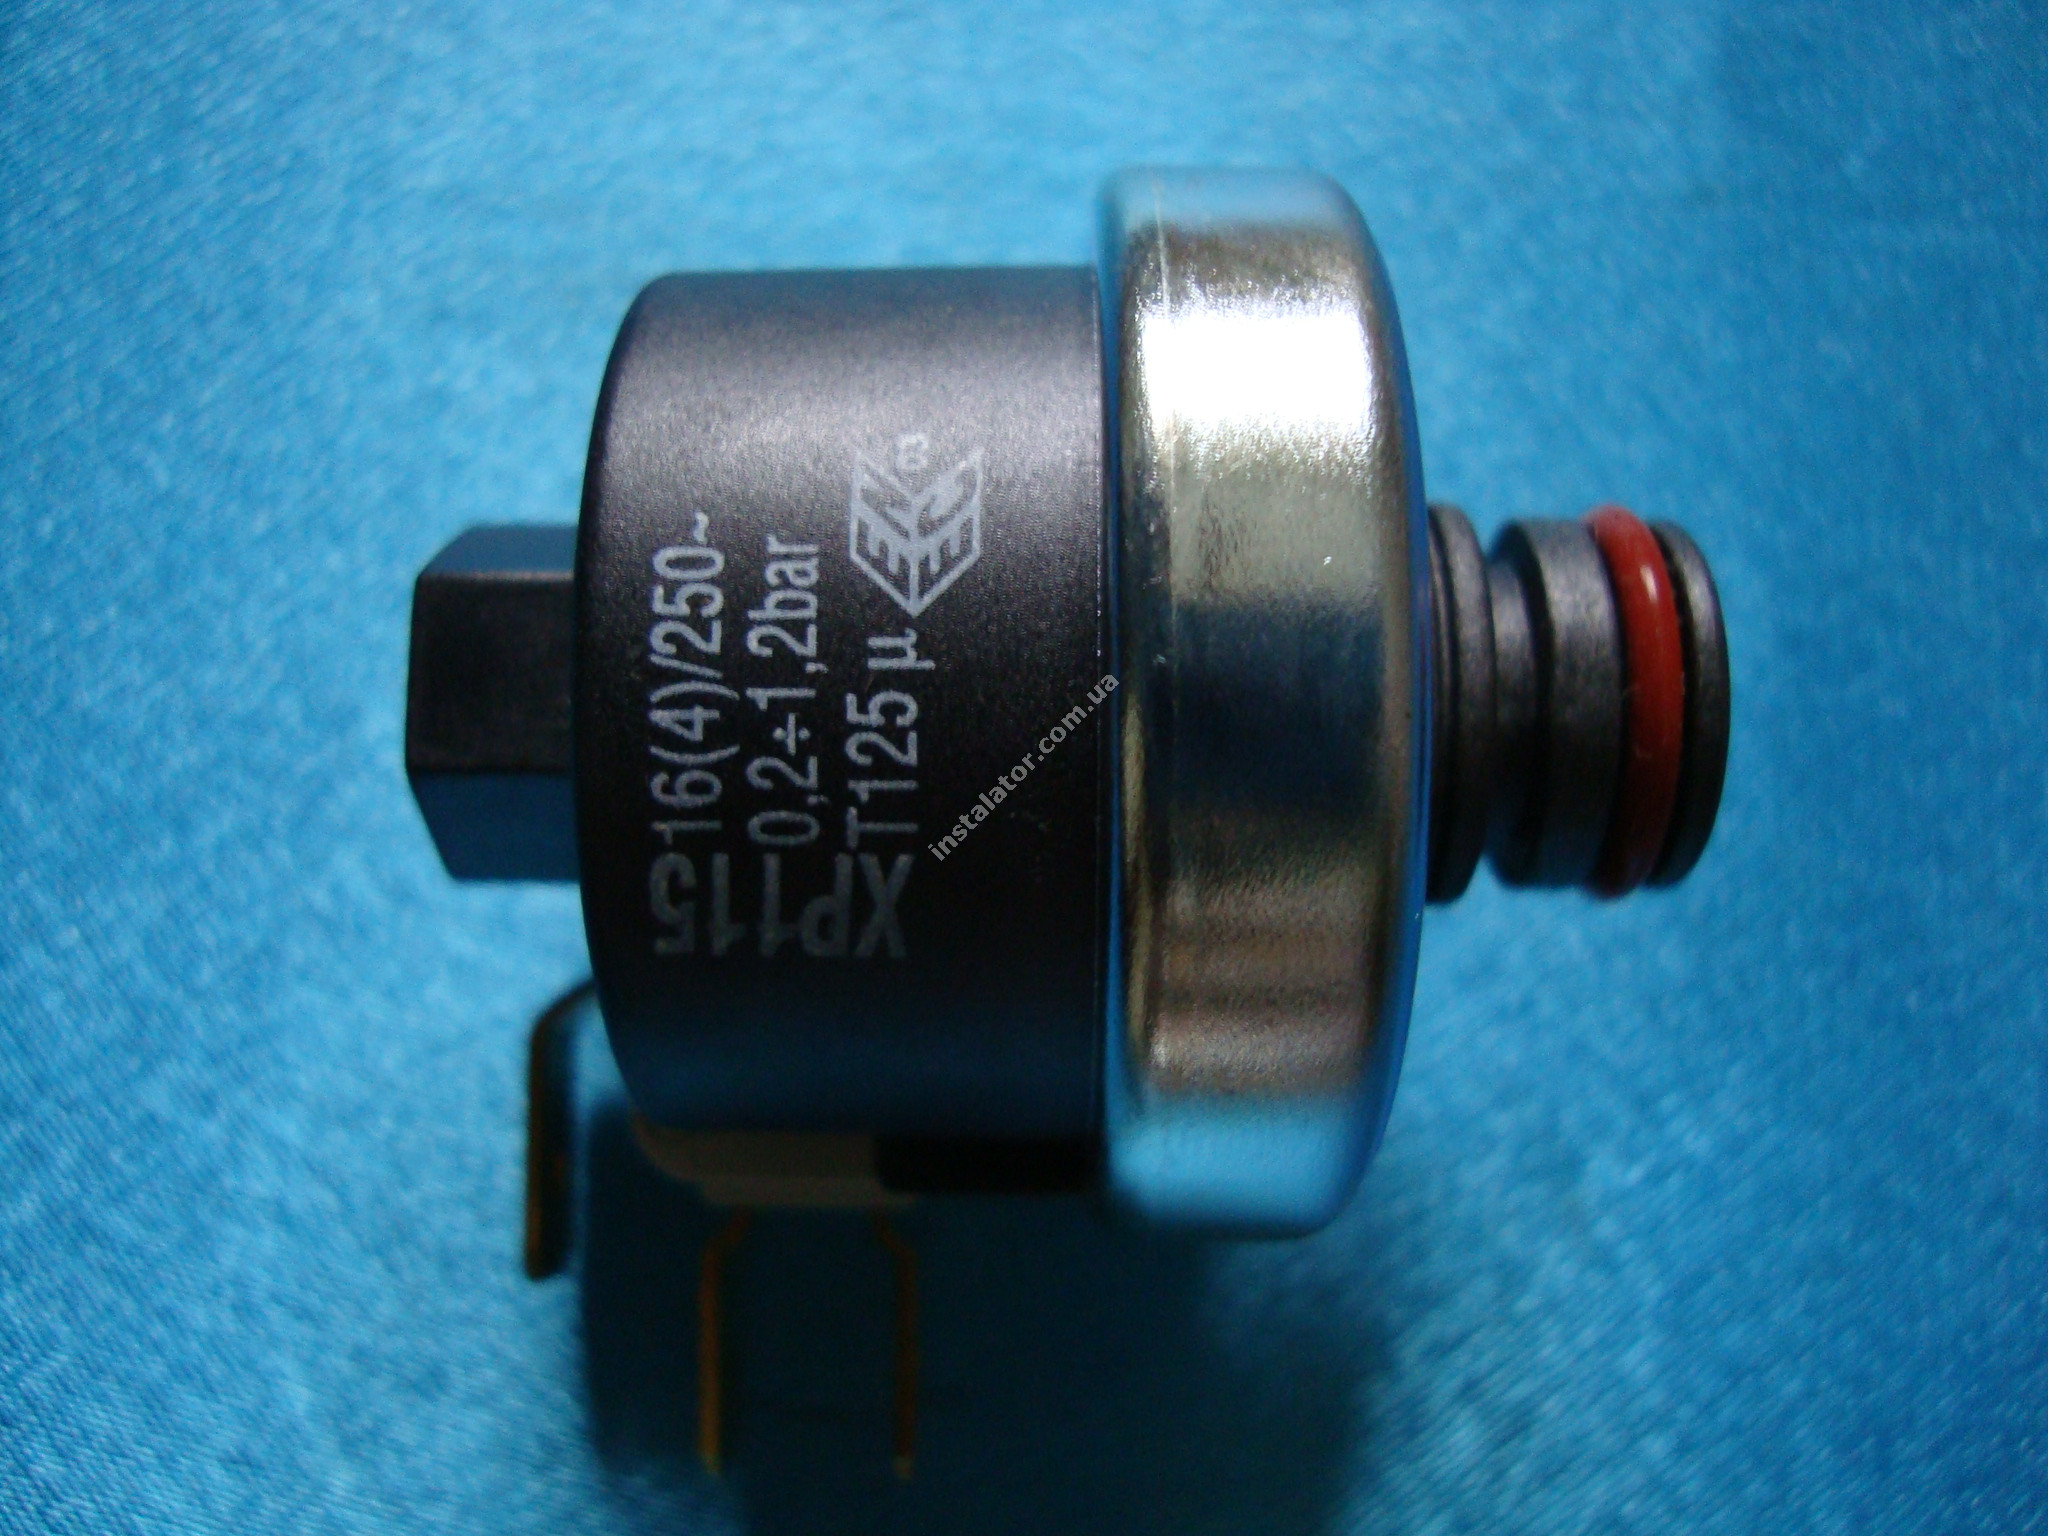 6PRESSAC01 Реле давления воды Vela Compact 0,2-1,2 бар